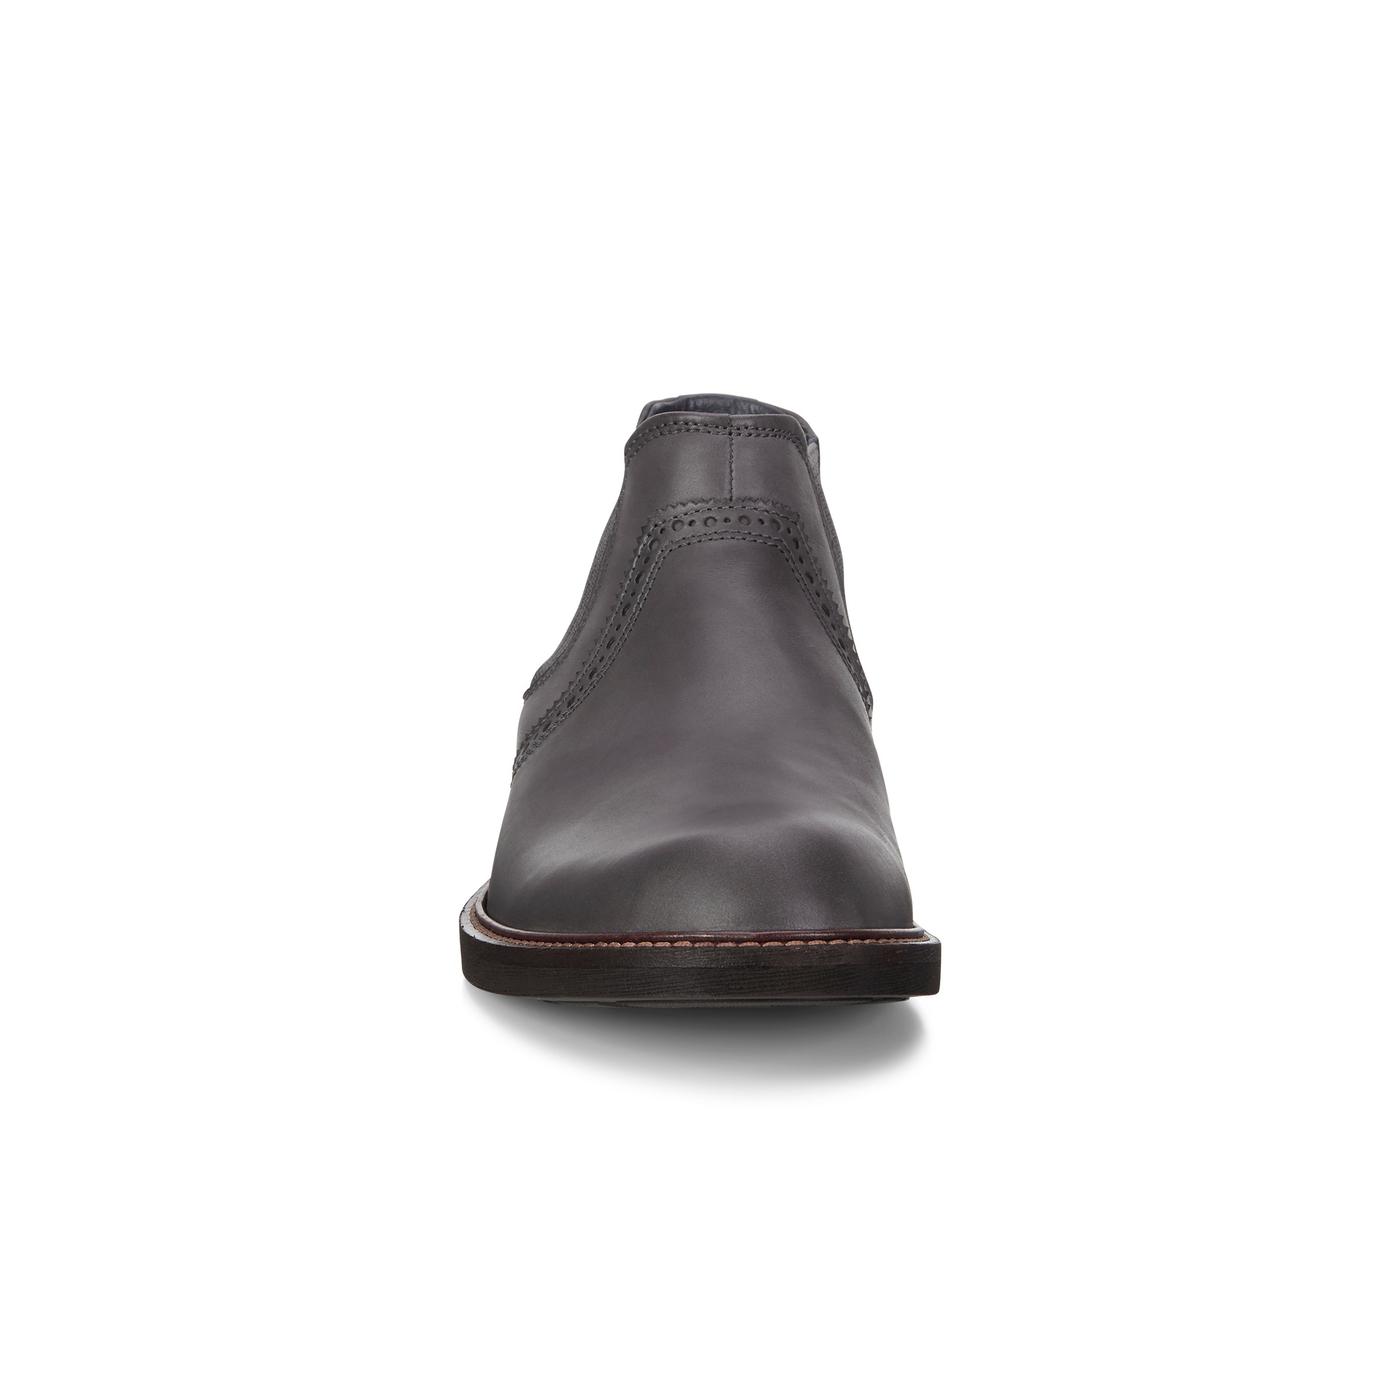 b9e63ab4 ECCO Kenton Men's Ankle Boots | ECCO® Shoes